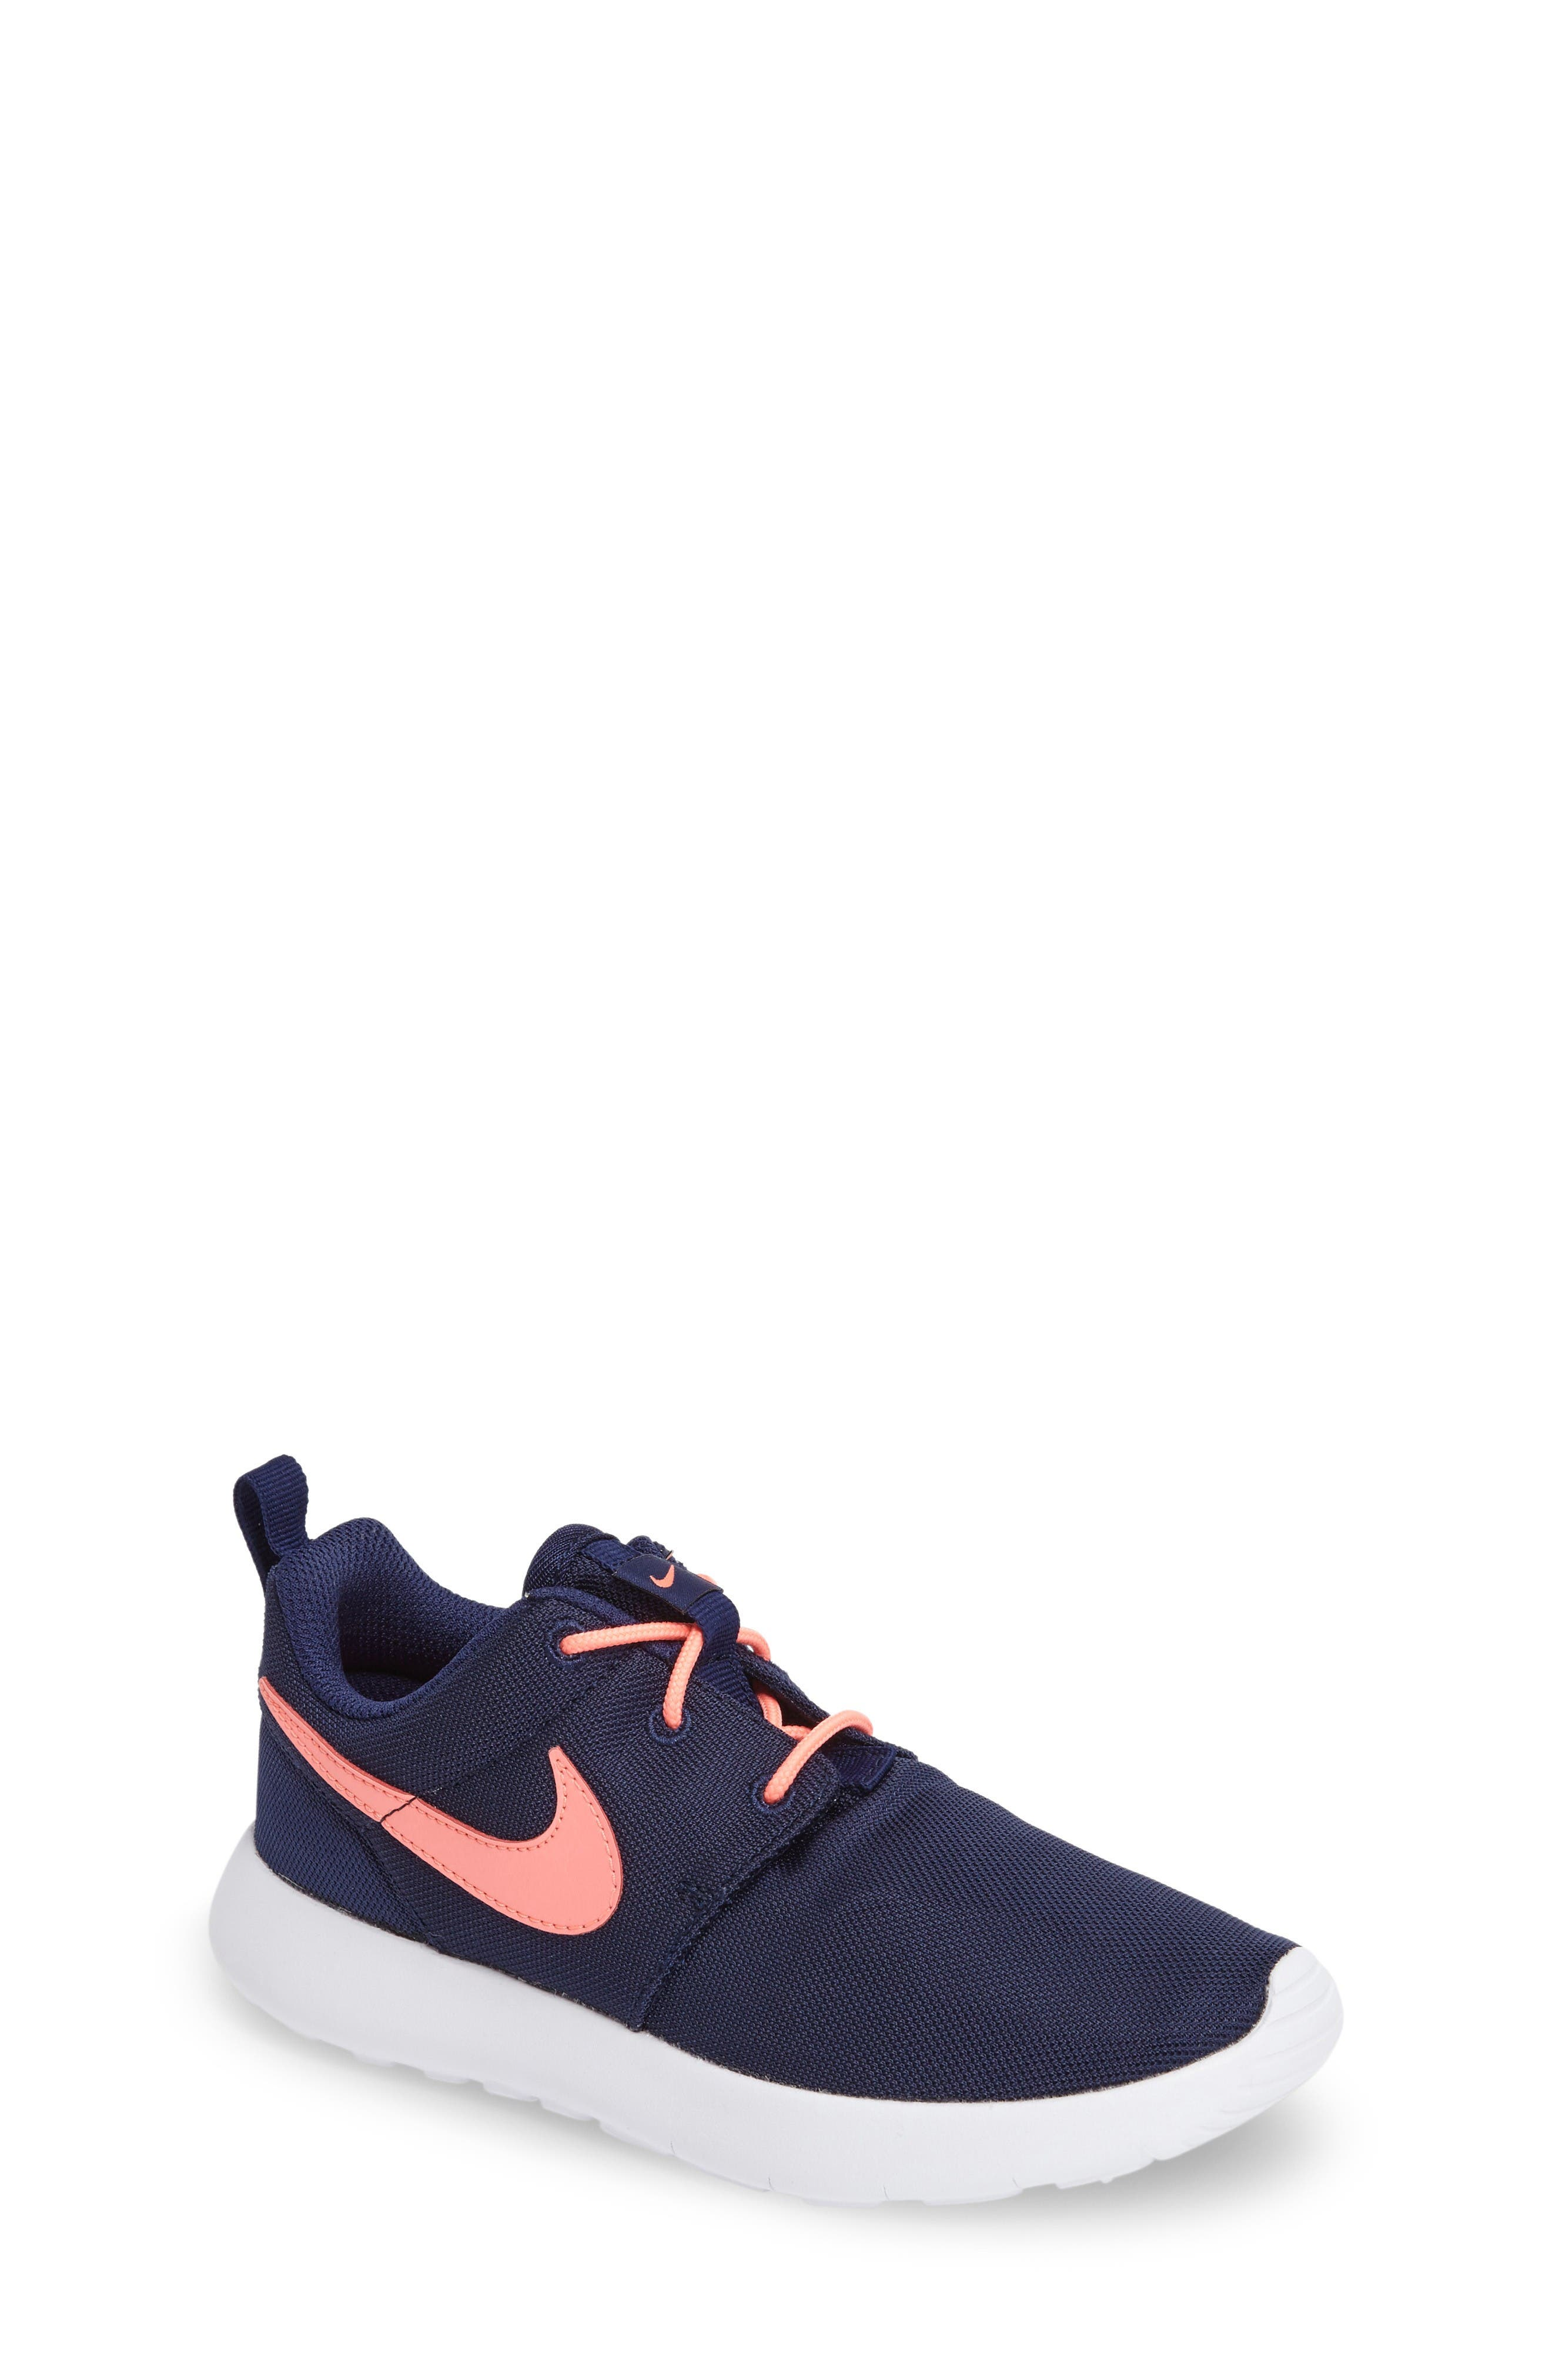 NIKE Roshe Run Shoe